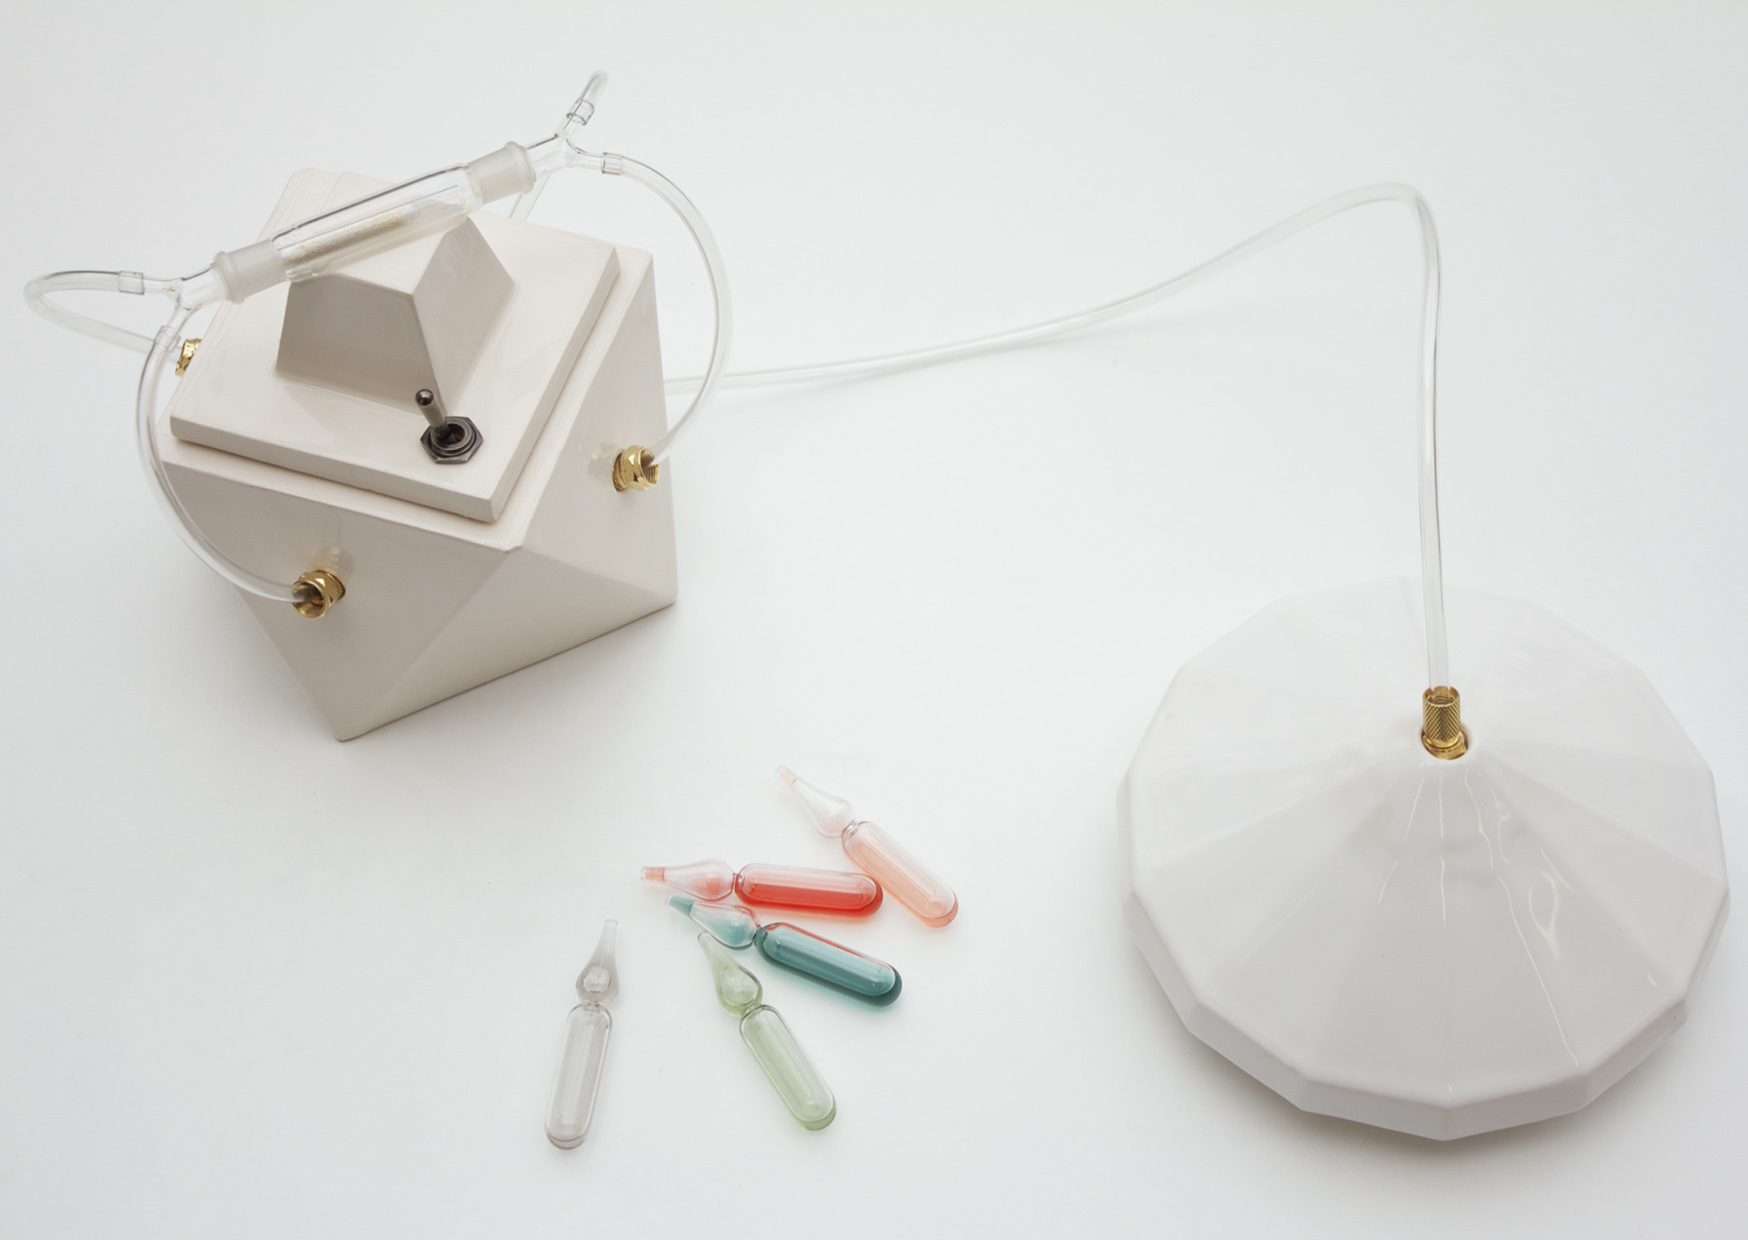 Madeleine 1 smell capture device